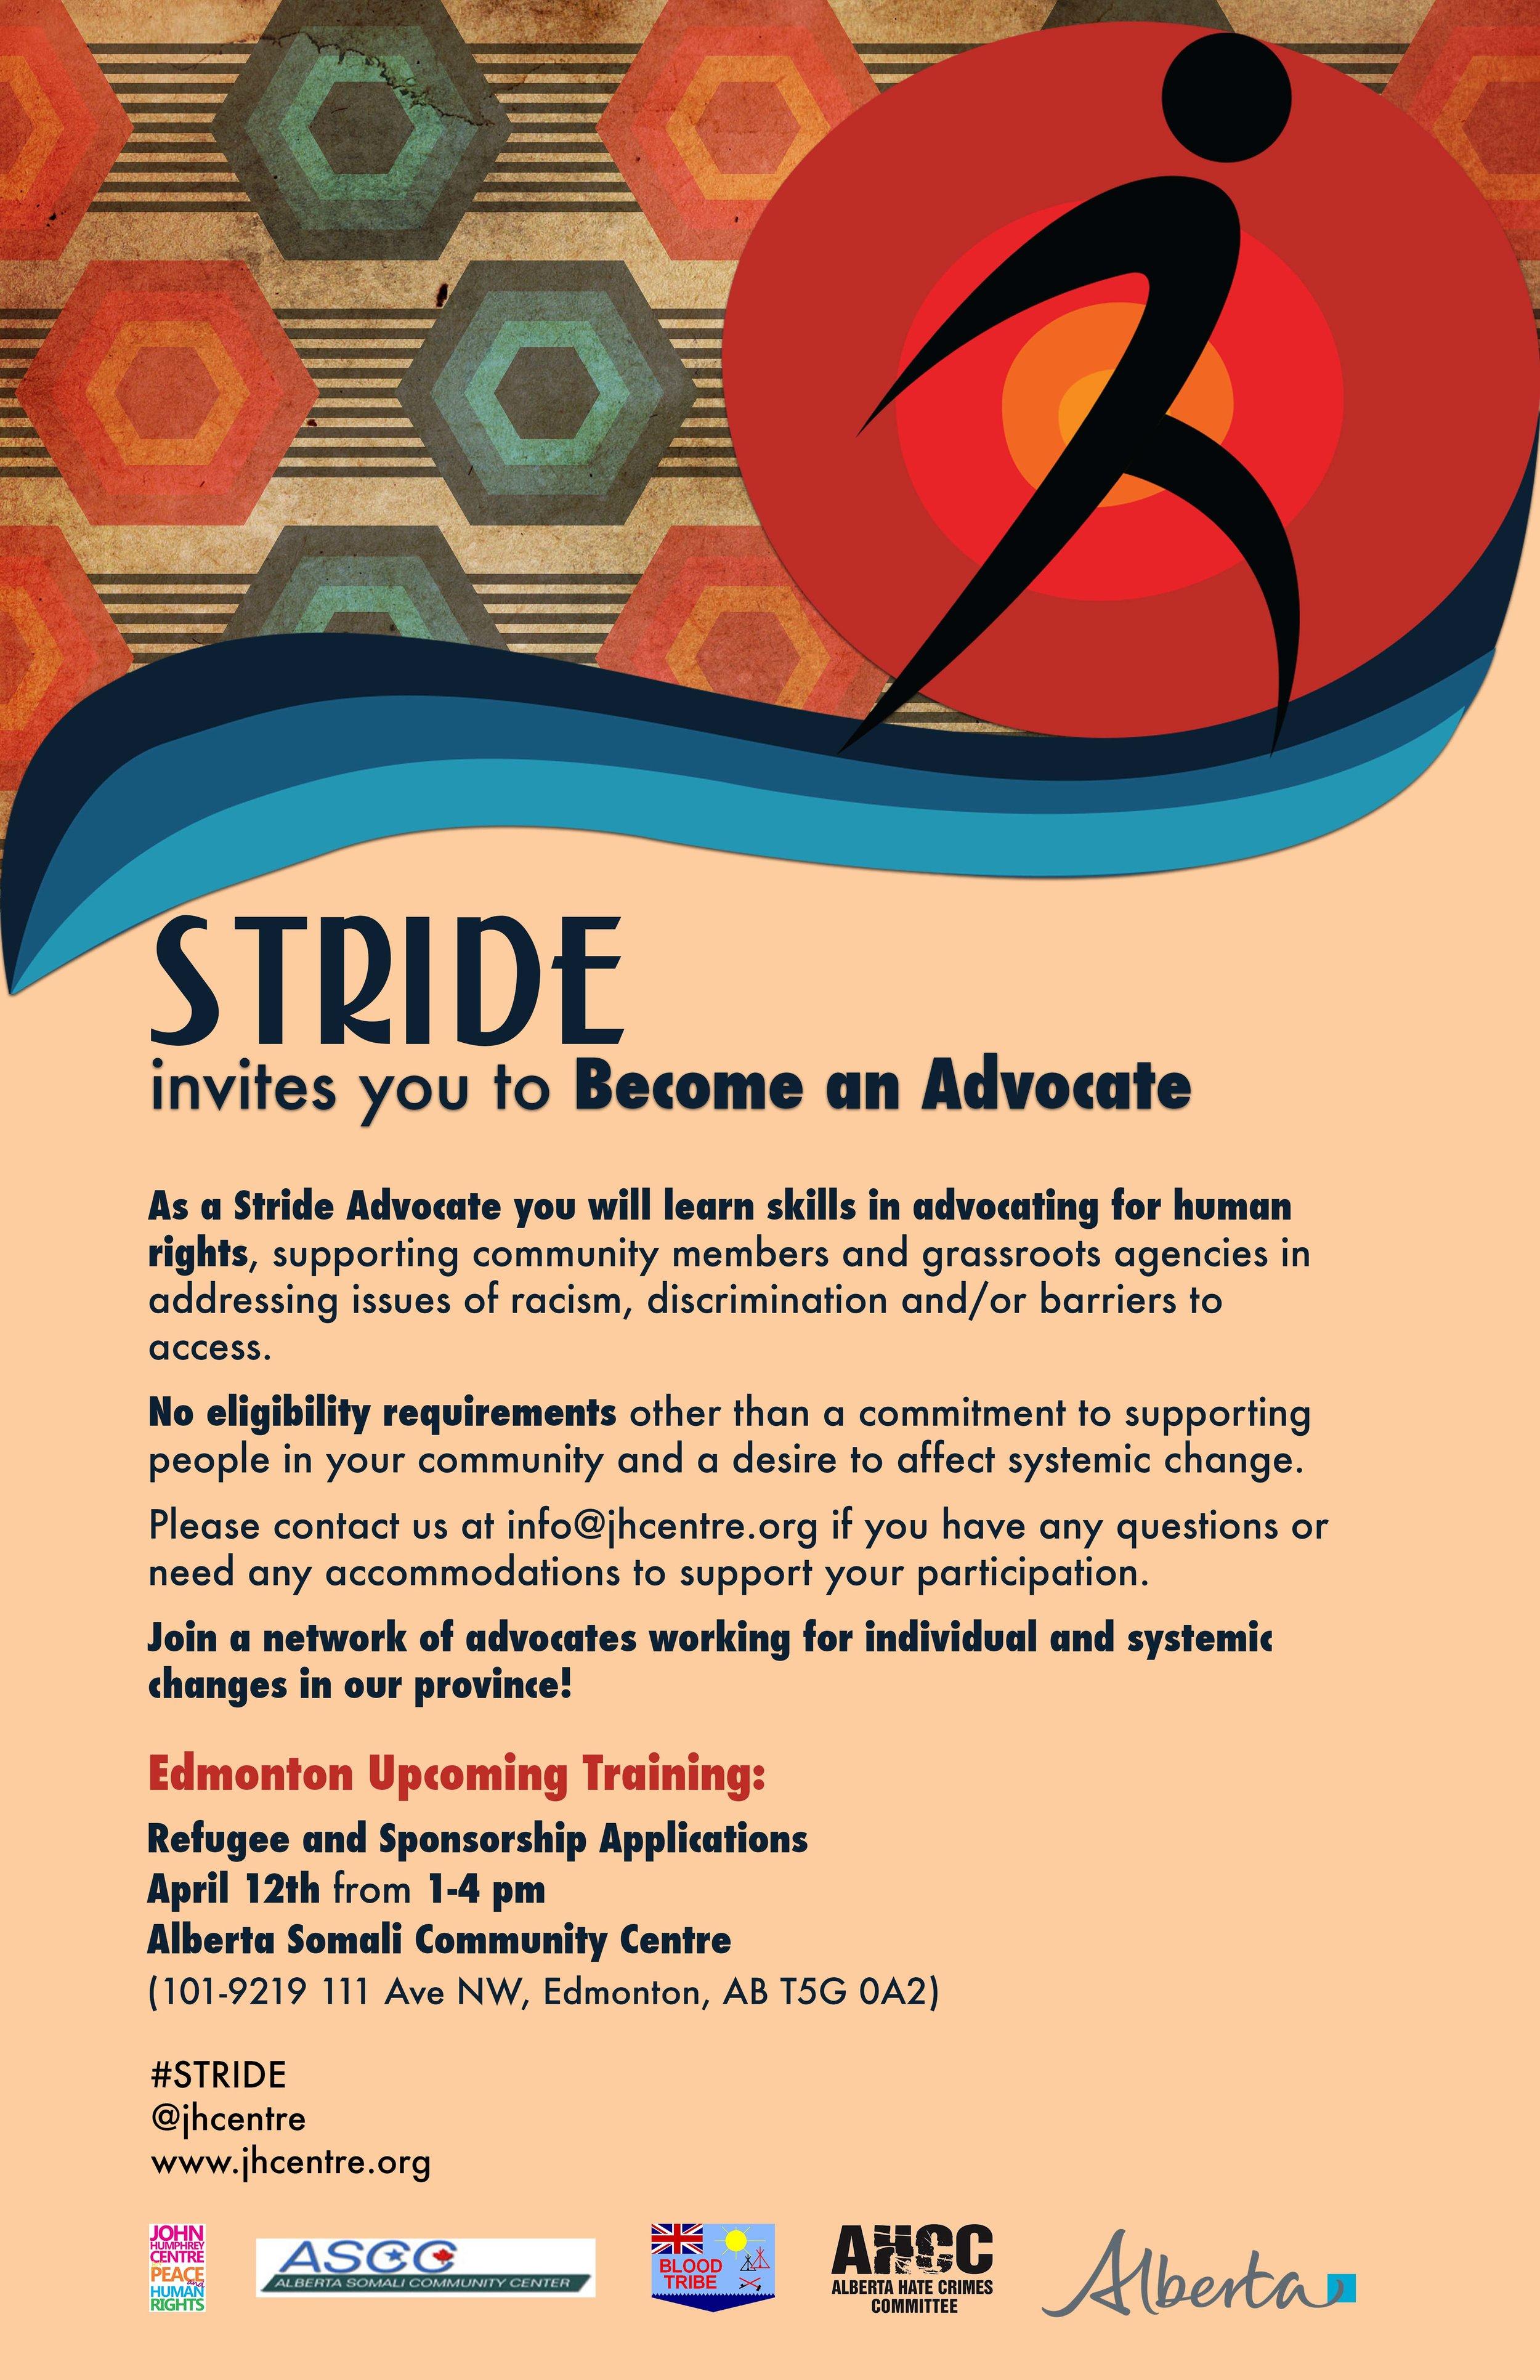 Stride Advocate Edmonton April 12.jpg